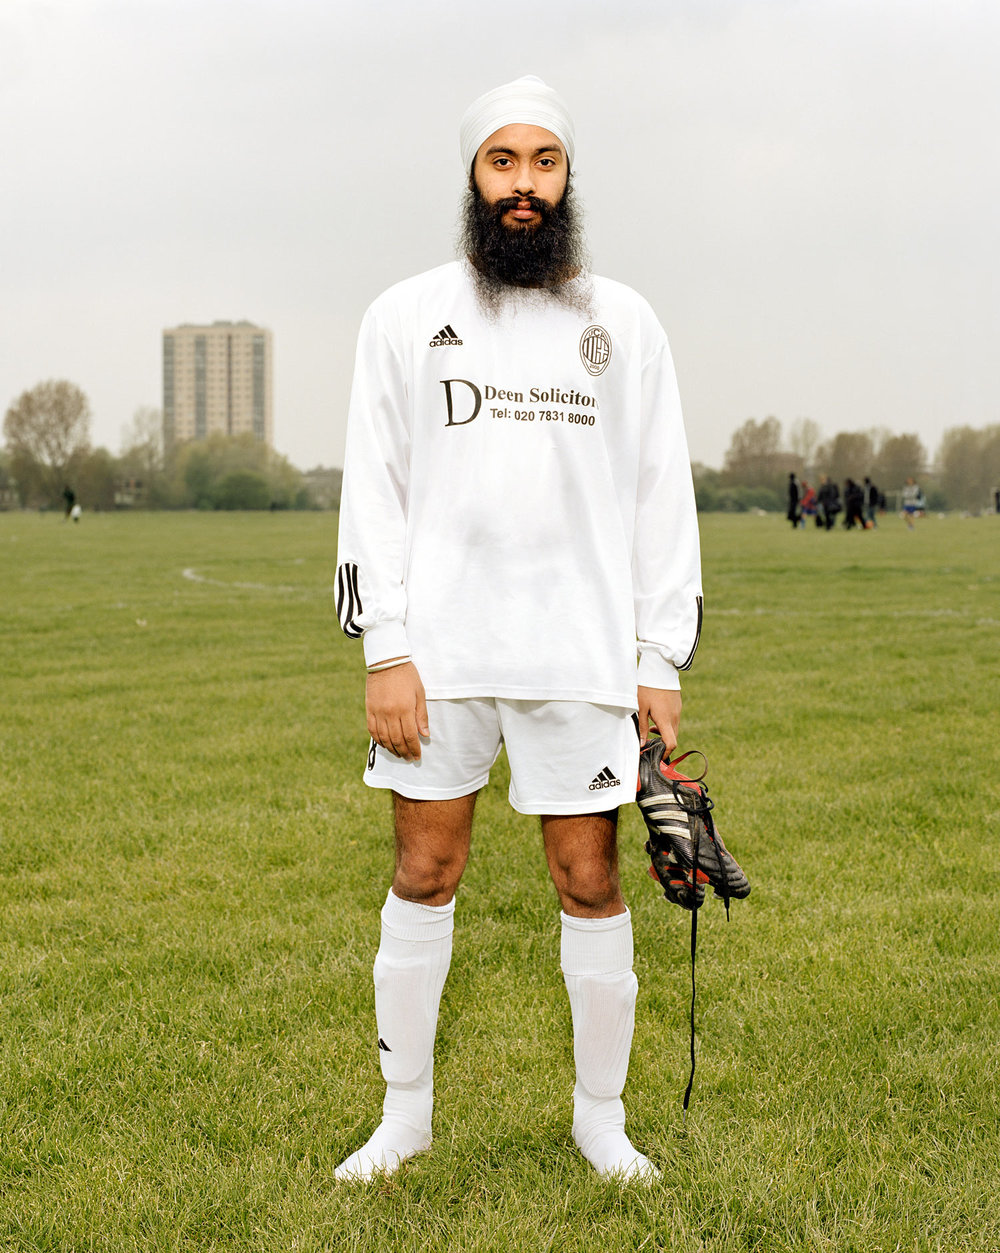 Reality Football / United Colour Asians / London